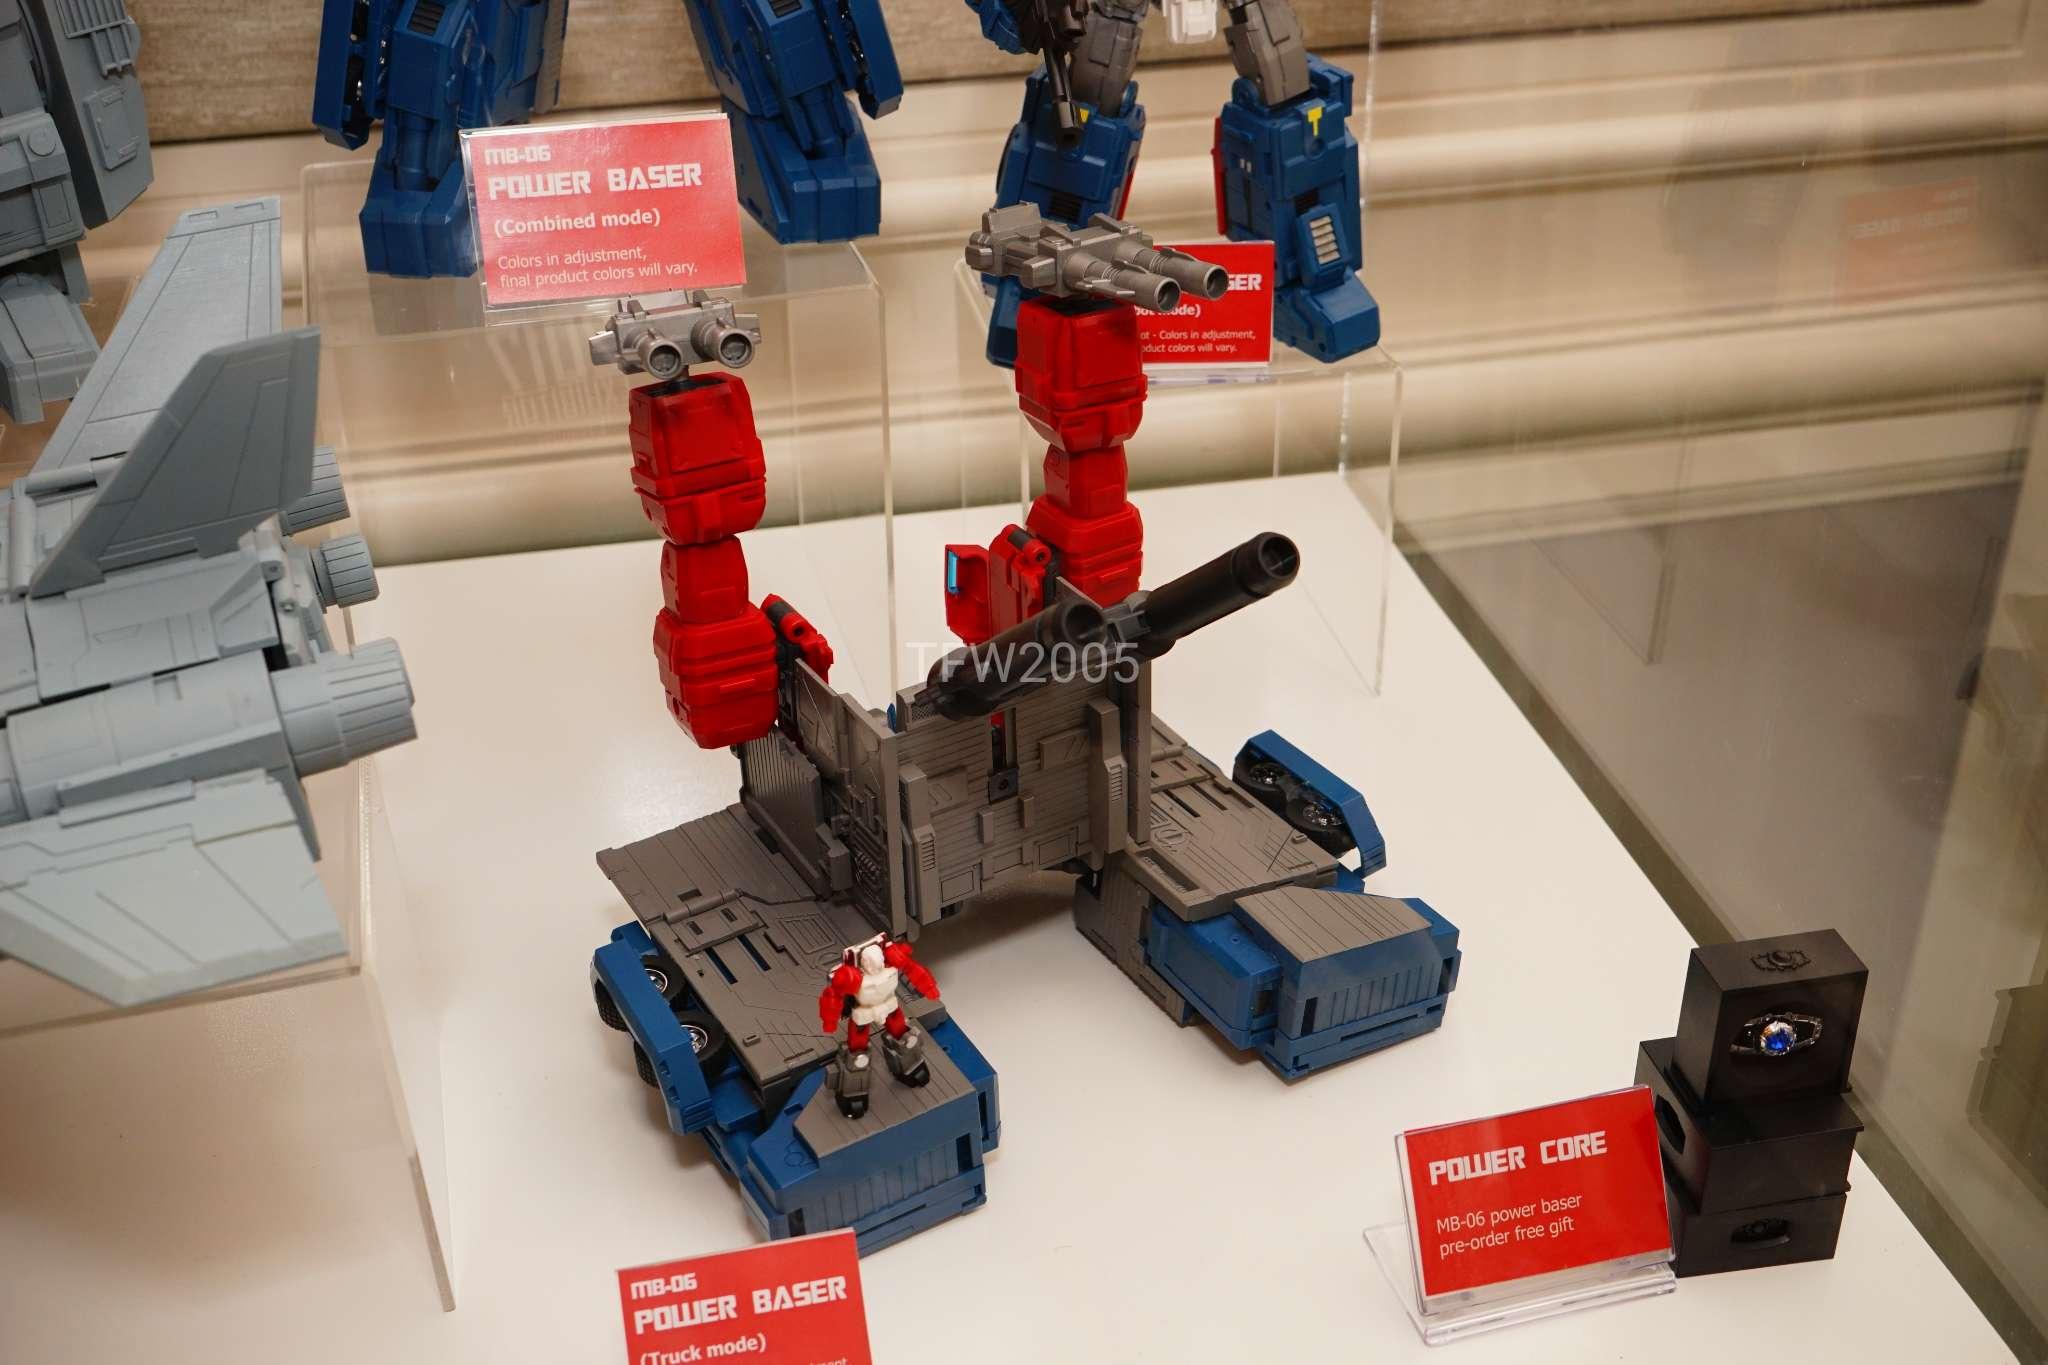 [FansHobby] Produit Tiers - MB-06 Power Baser (aka Powermaster Optimus) + MB-11 God Armour (aka Godbomber) - TF Masterforce - Page 2 KmRbcw5P_o